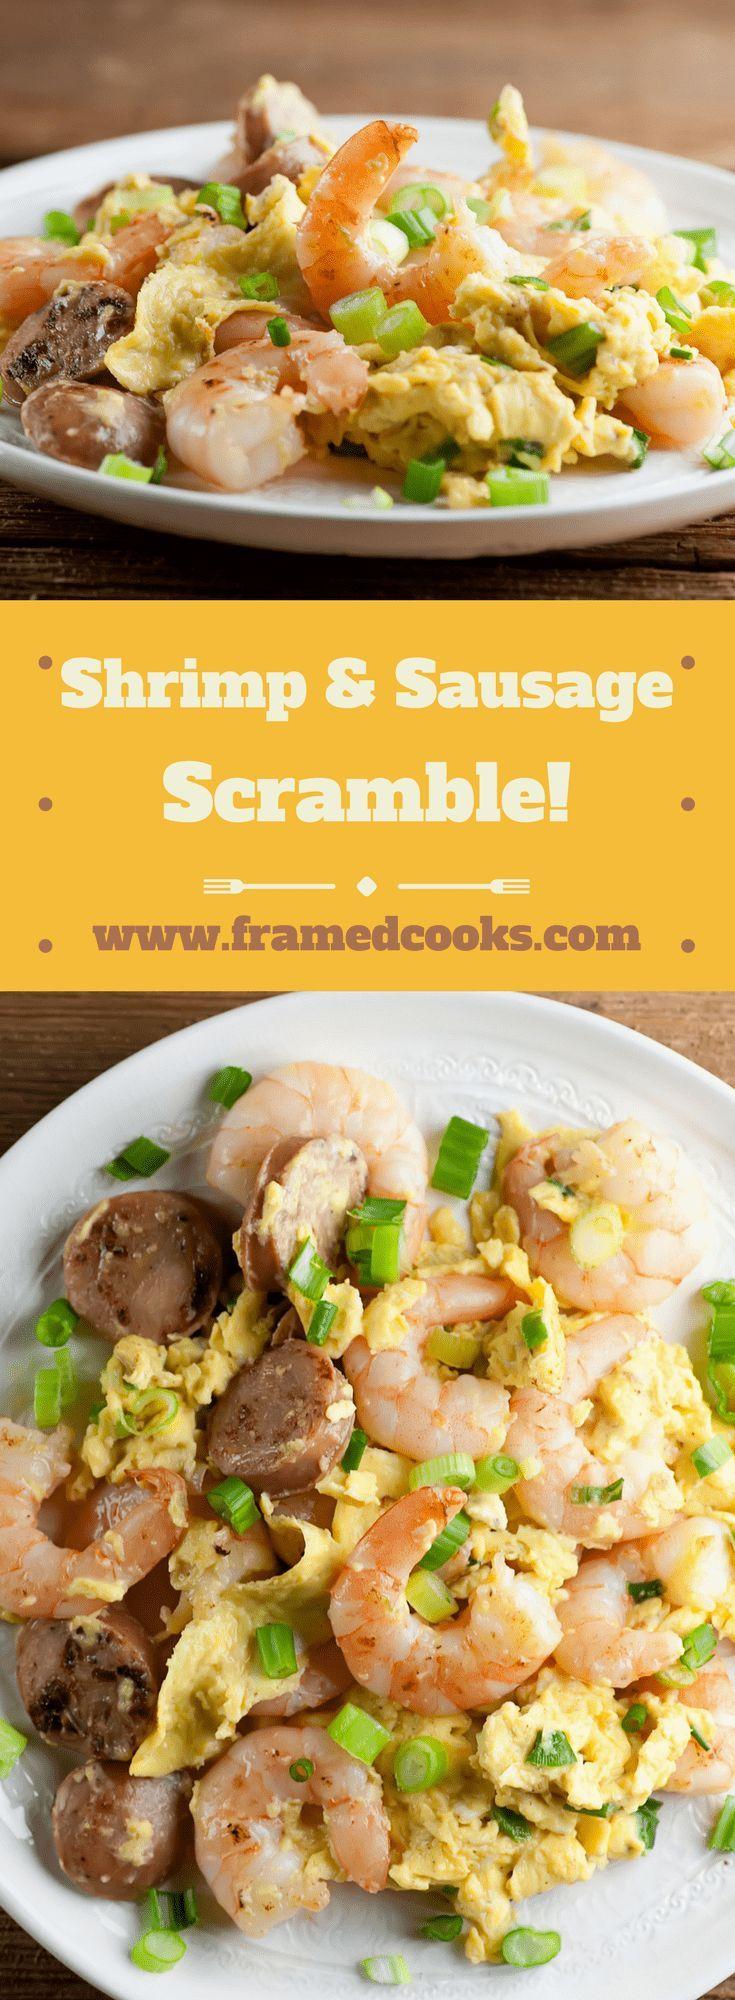 Shrimp and Sausage Scramble images